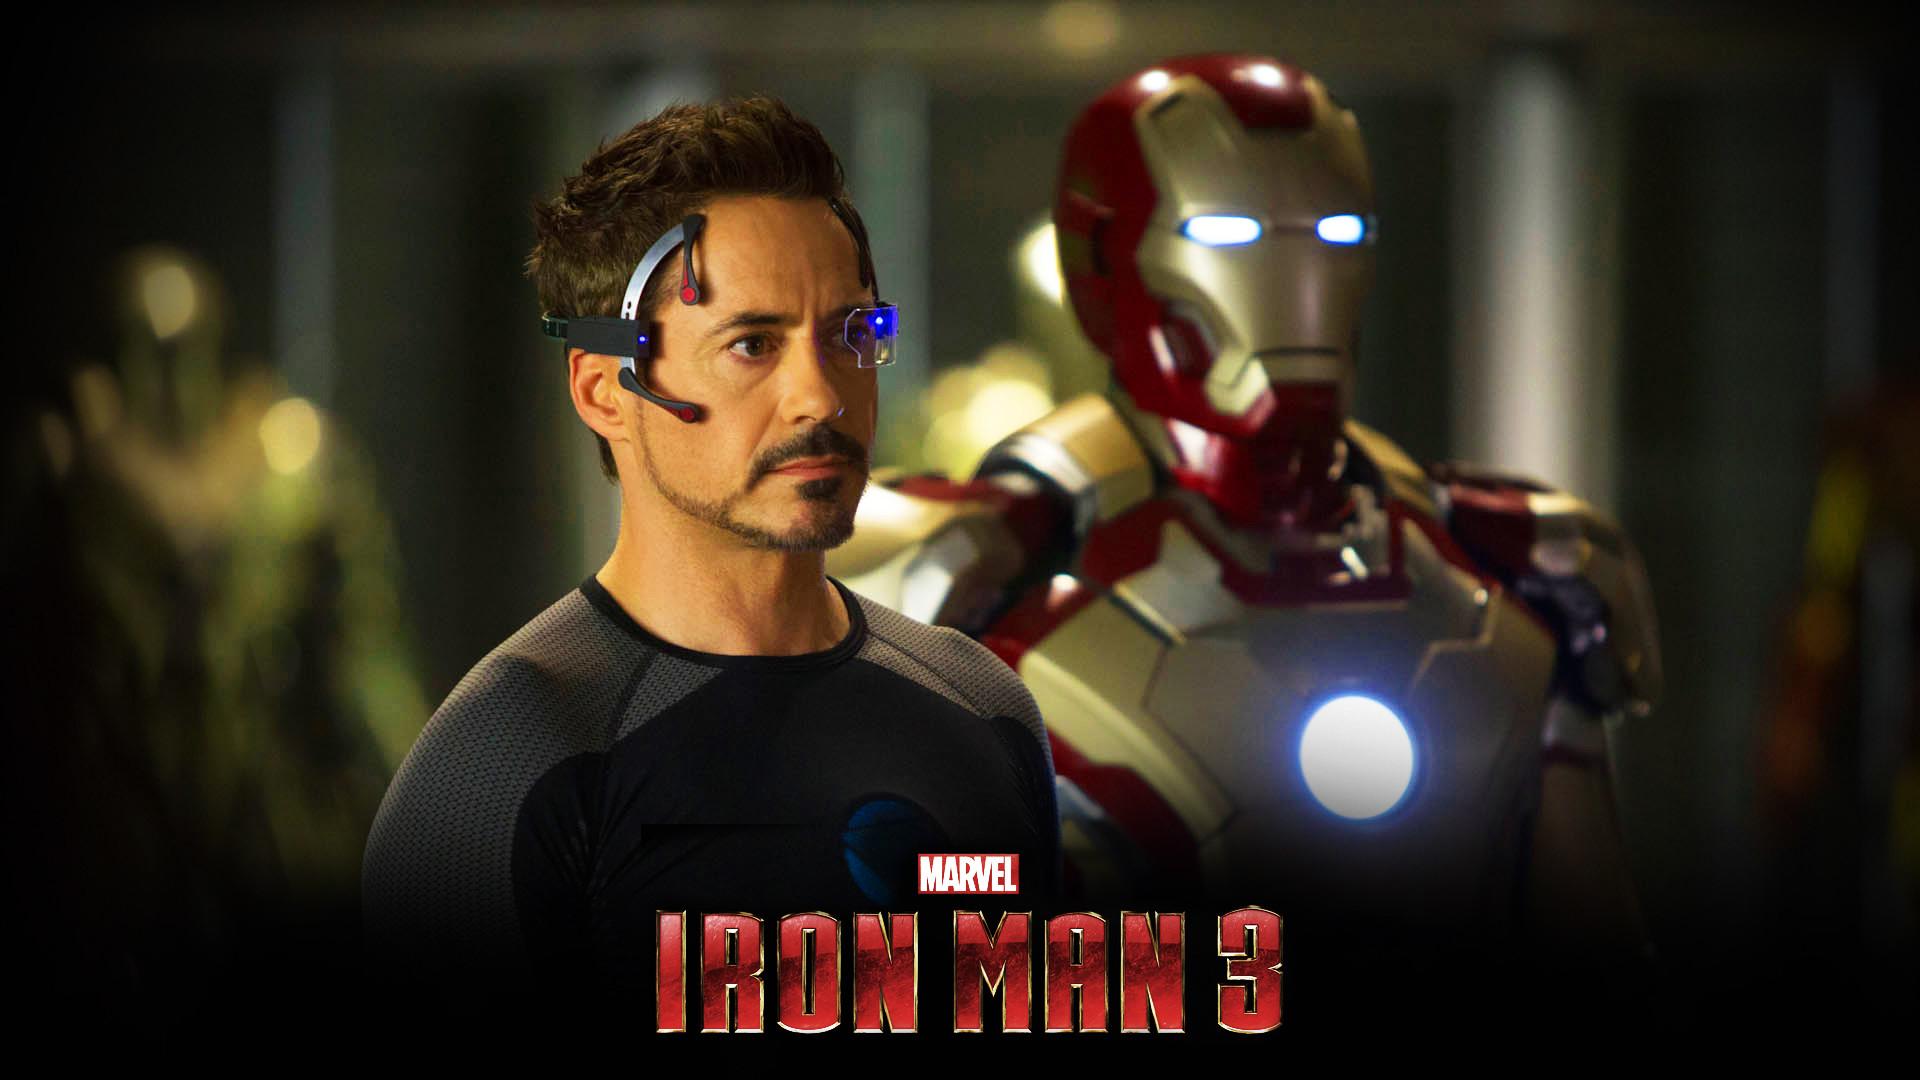 Wallpaper Superhero Marvel 3d Robert Downey Jr Iron Man Wallpaper 183 ① Wallpapertag